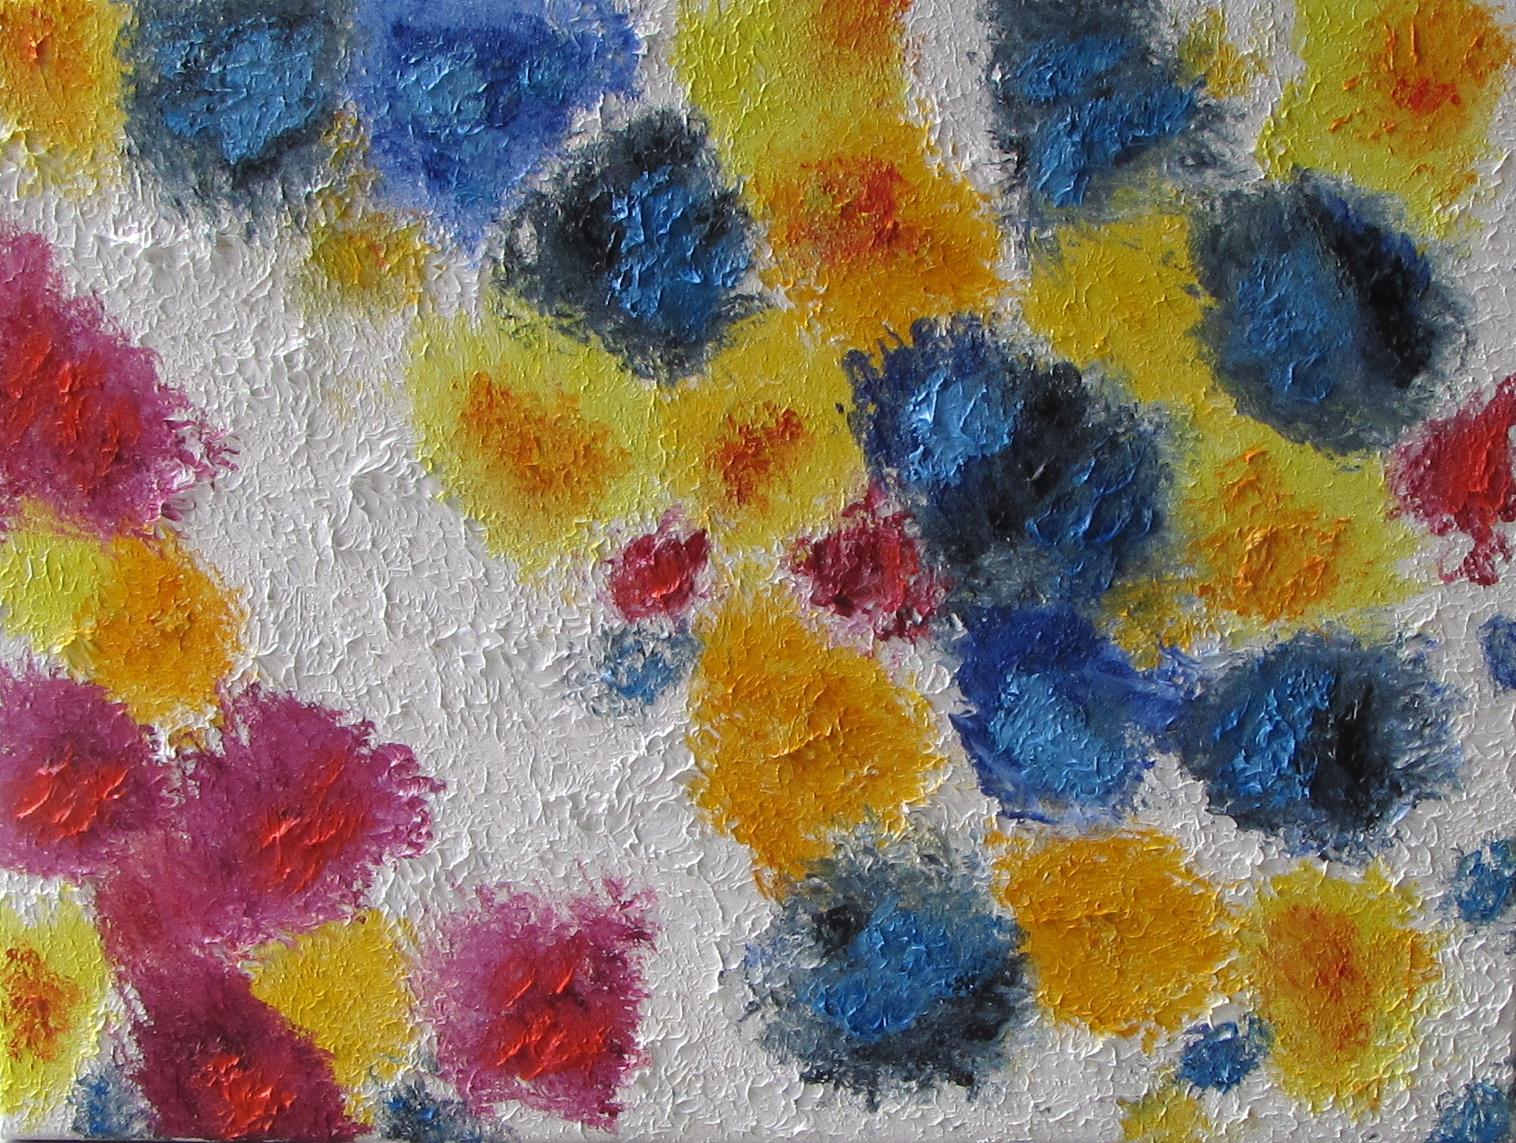 Rain, Russell Steven Powell oil on canvas, 24x18